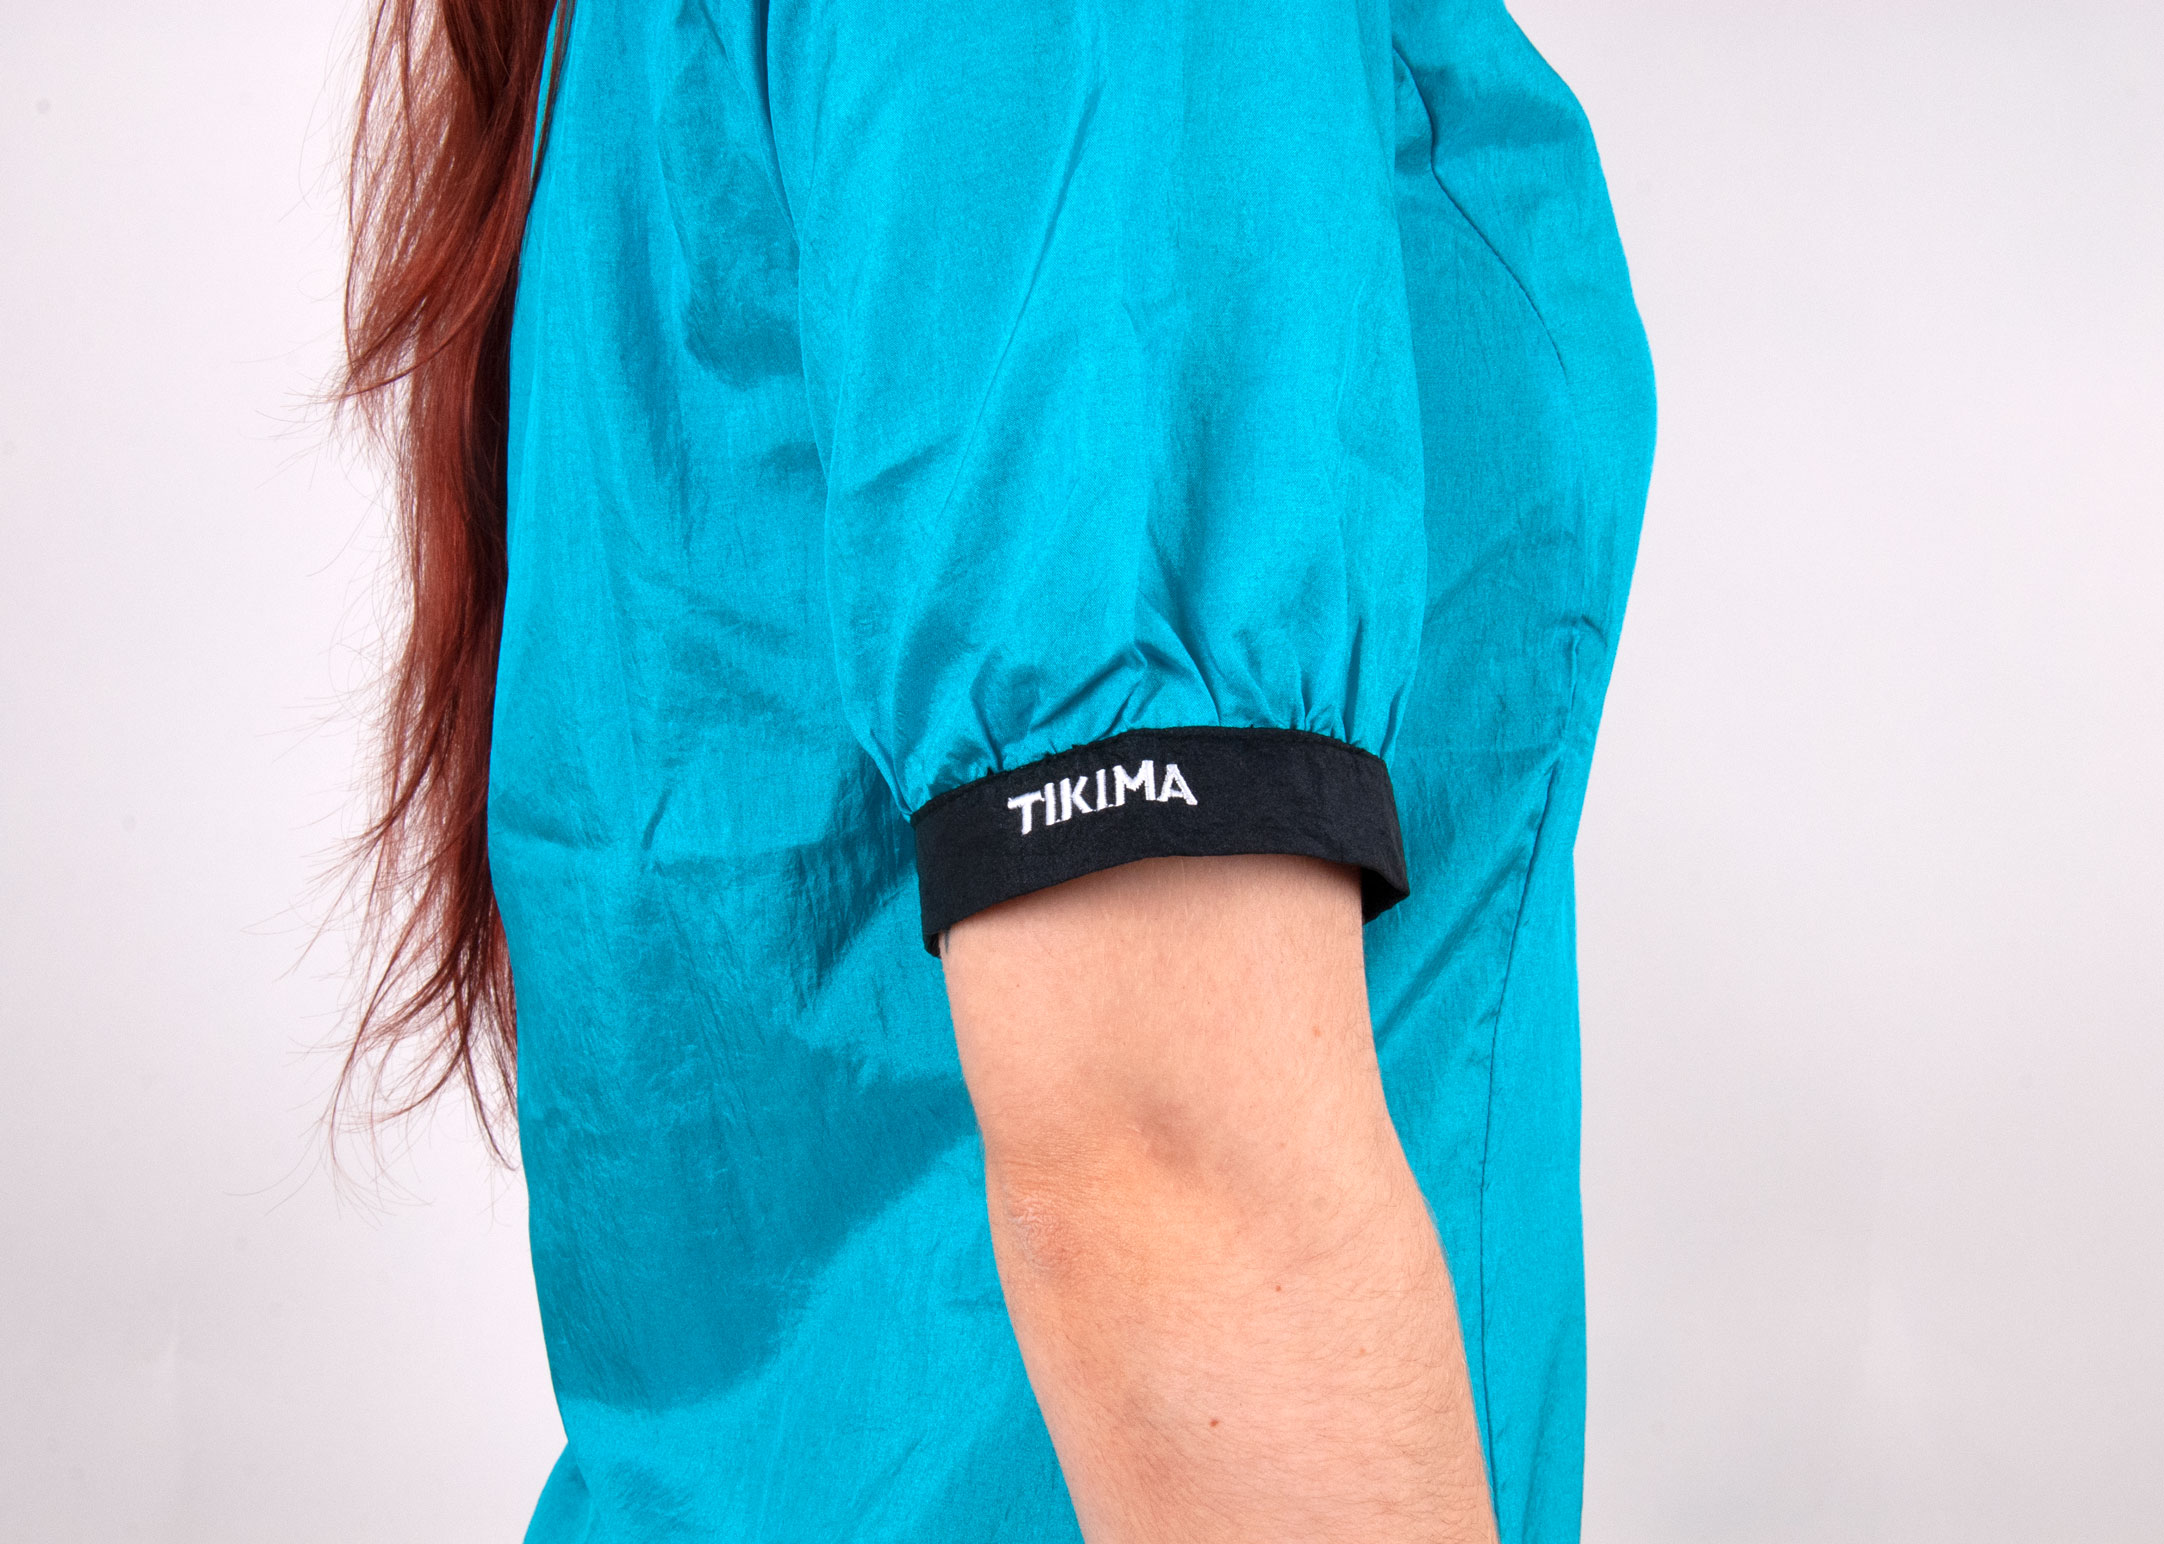 Tikima Alicia Shirt S  Turquoise